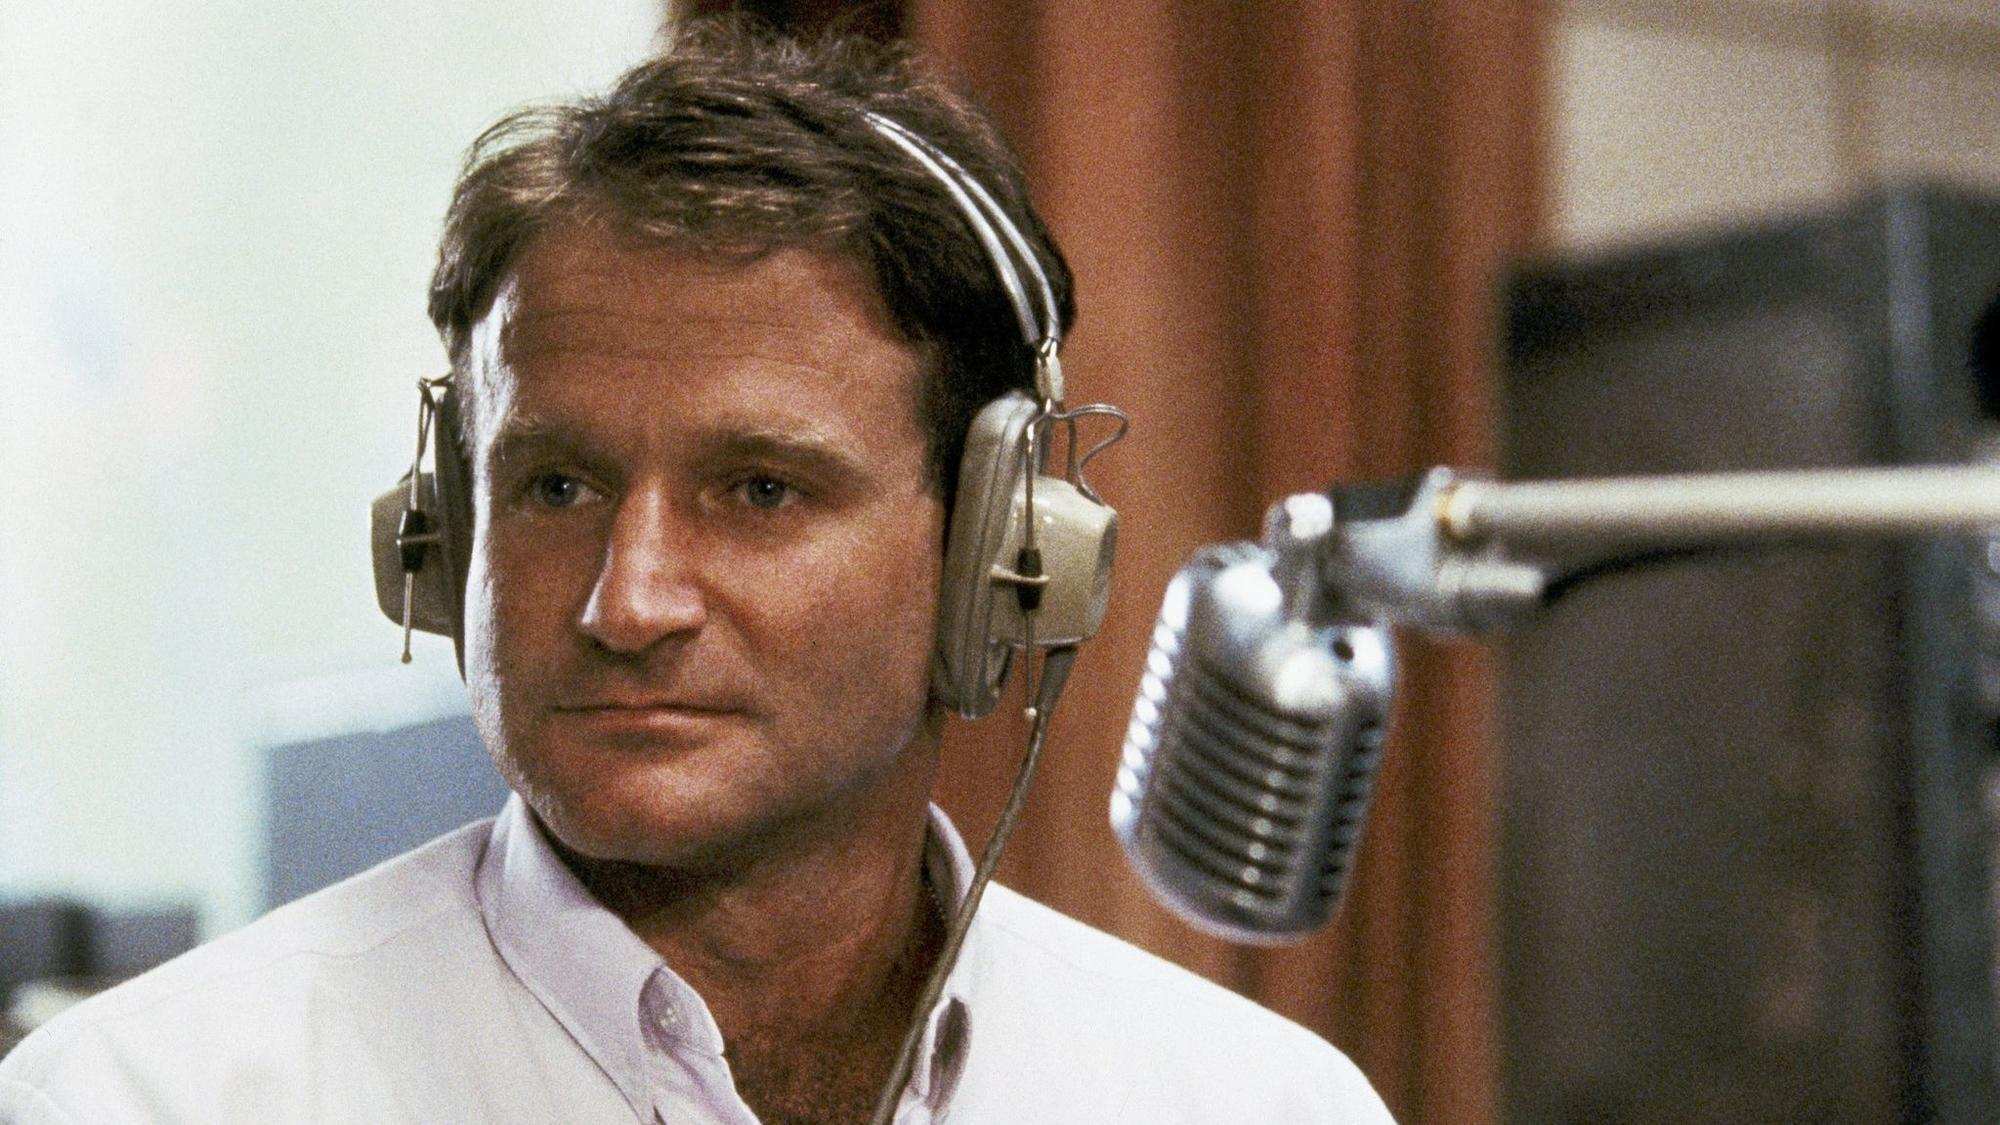 Adrian Cronauer, inspiration for 'Good Morning, Vietnam,' dies at 79